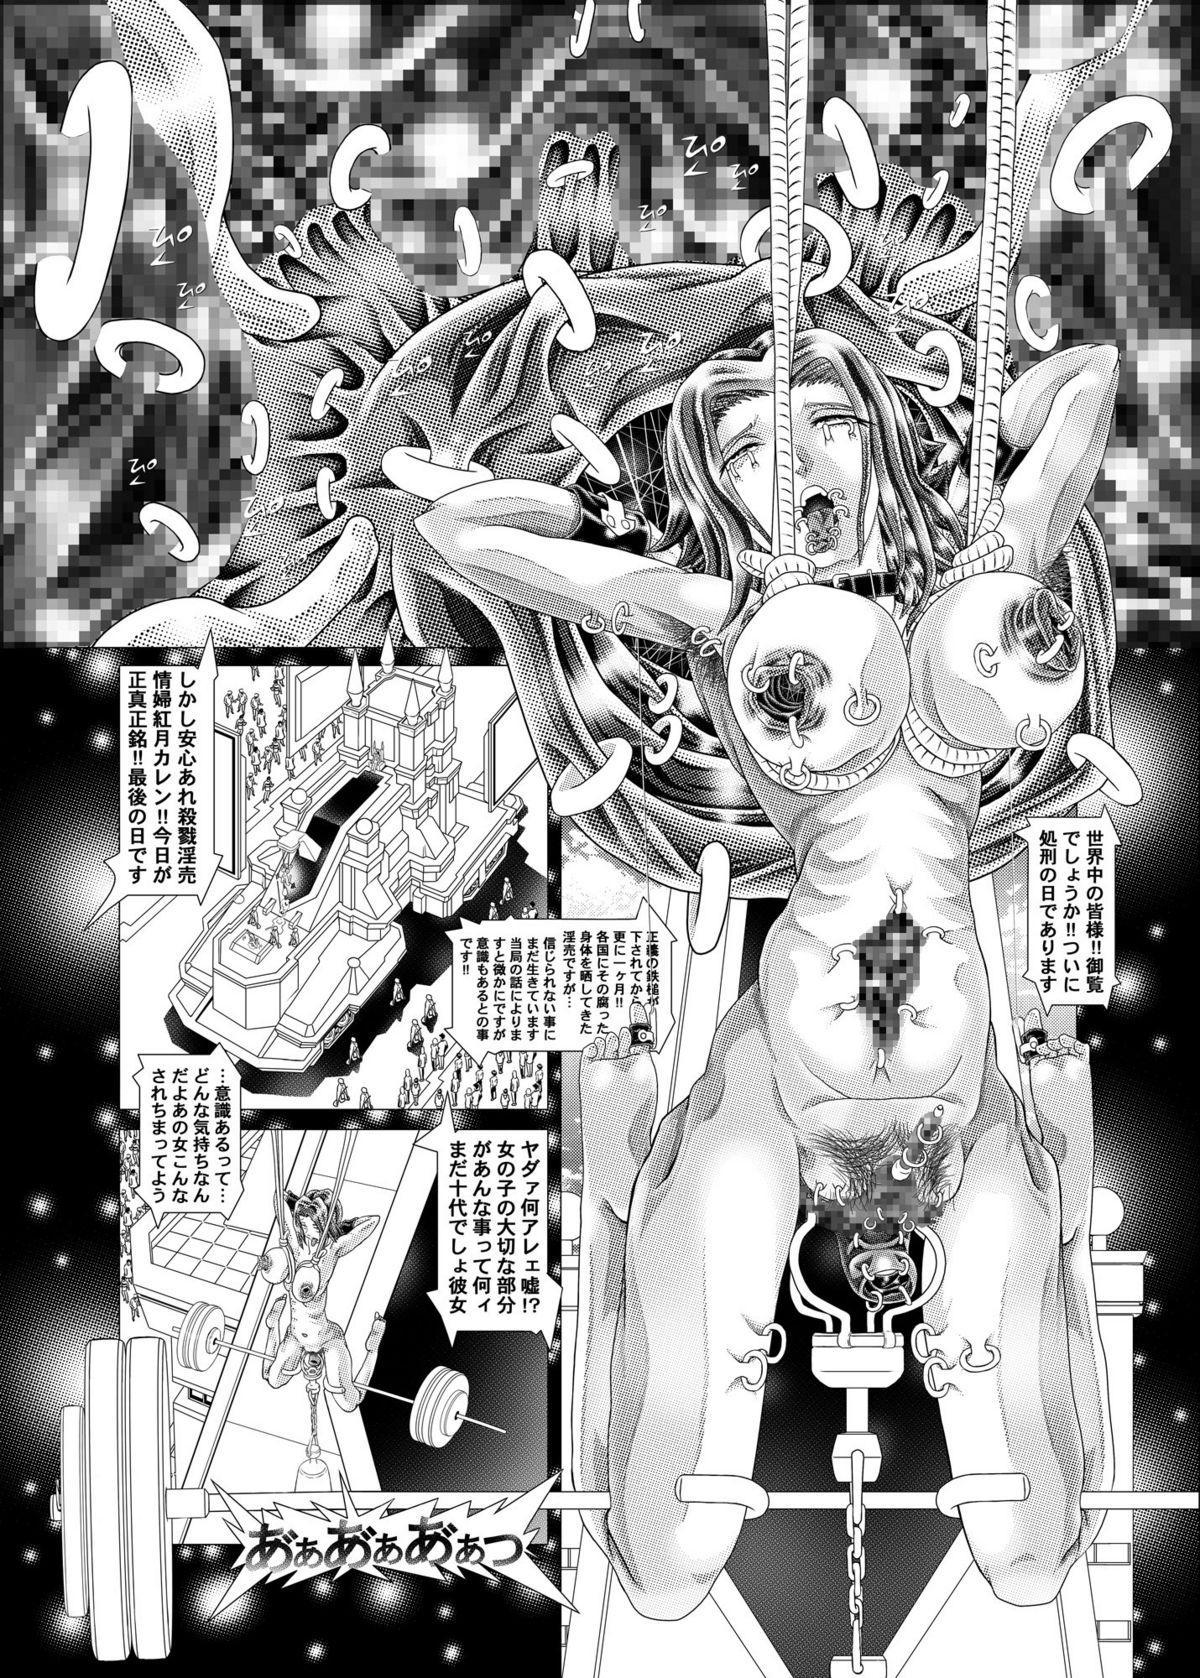 [Kaki no Boo (Kakinomoto Utamaro)] Karen - R22 of the Cord Eros - Infringement (Code Geass) [Digital] 22